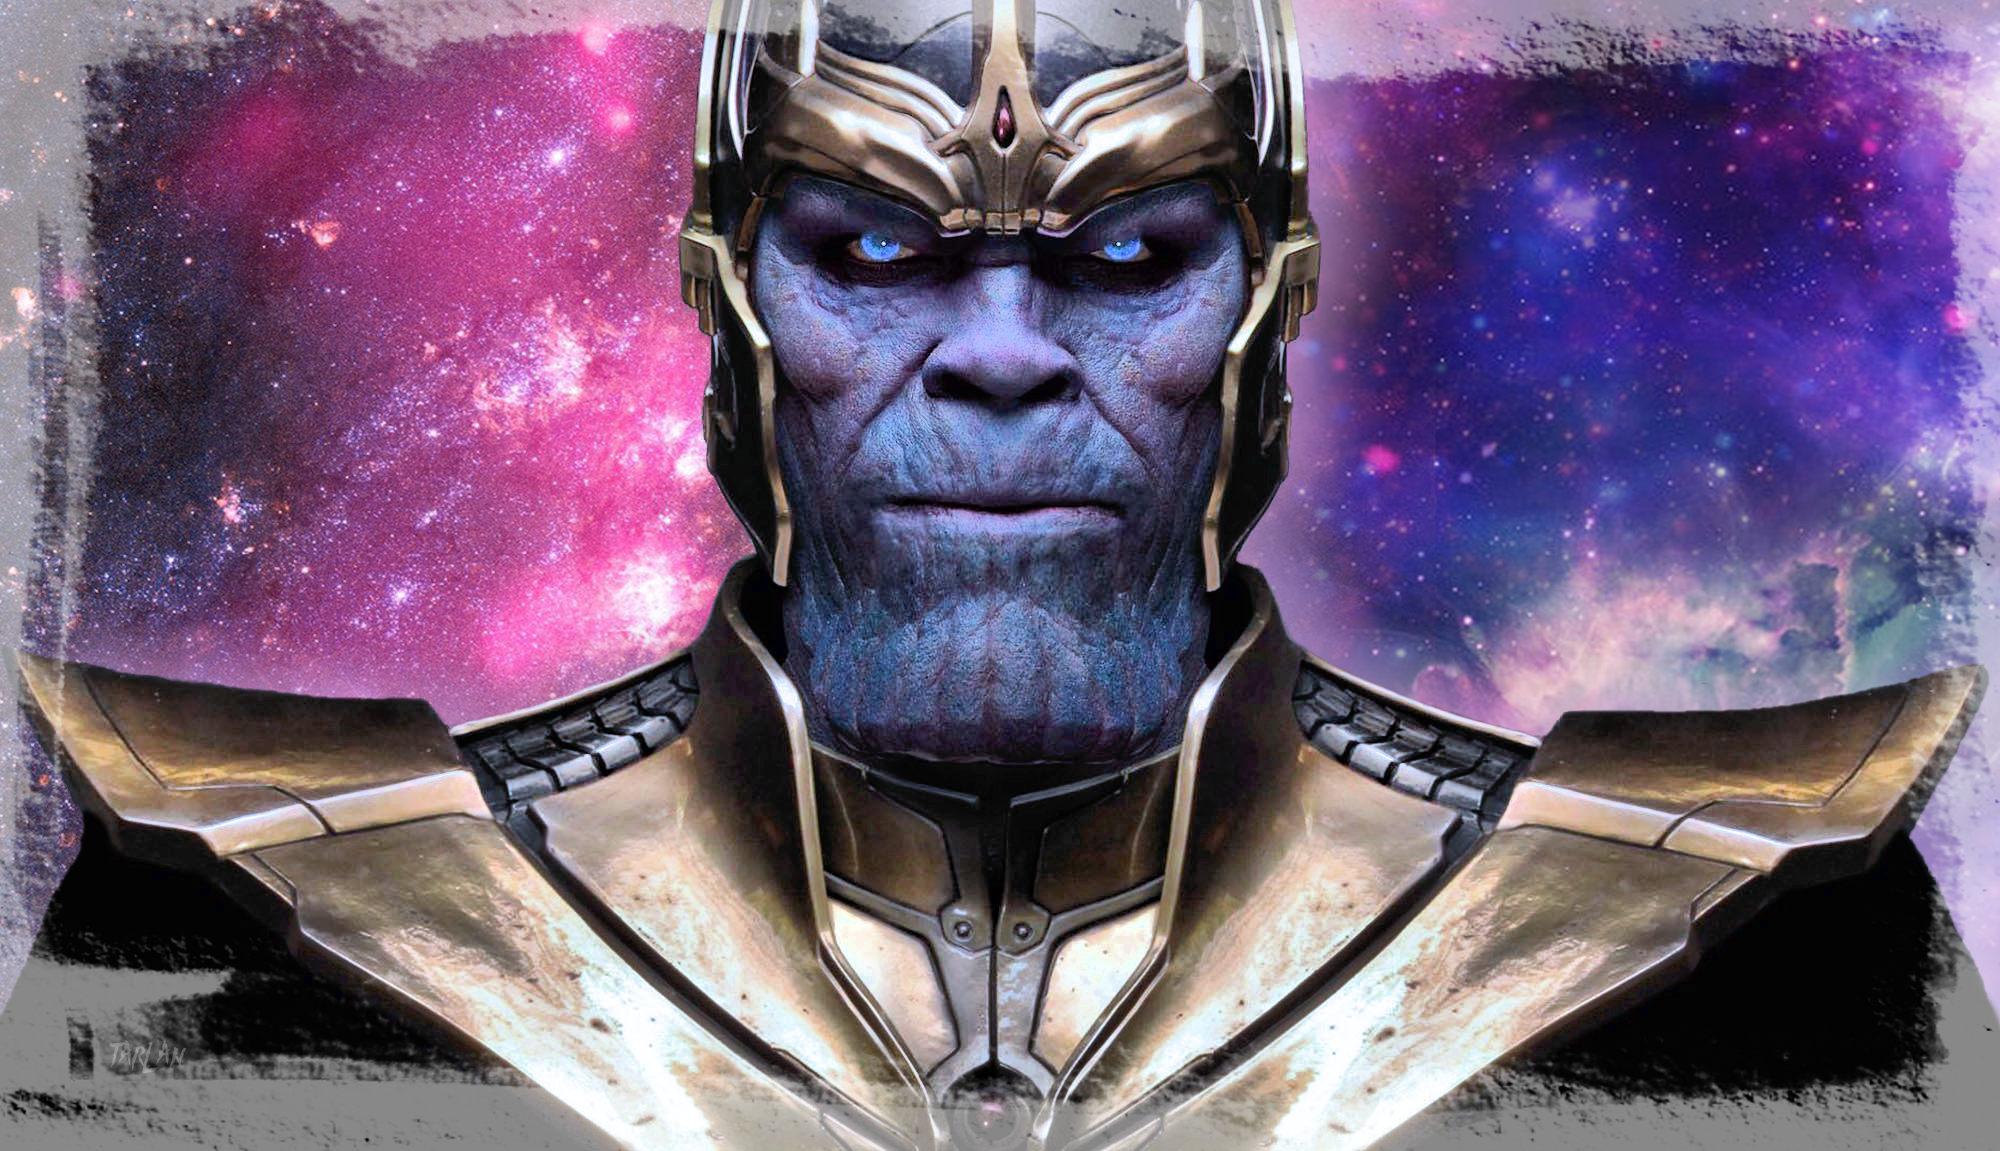 12-03 Thanos - MCU by Tarlan